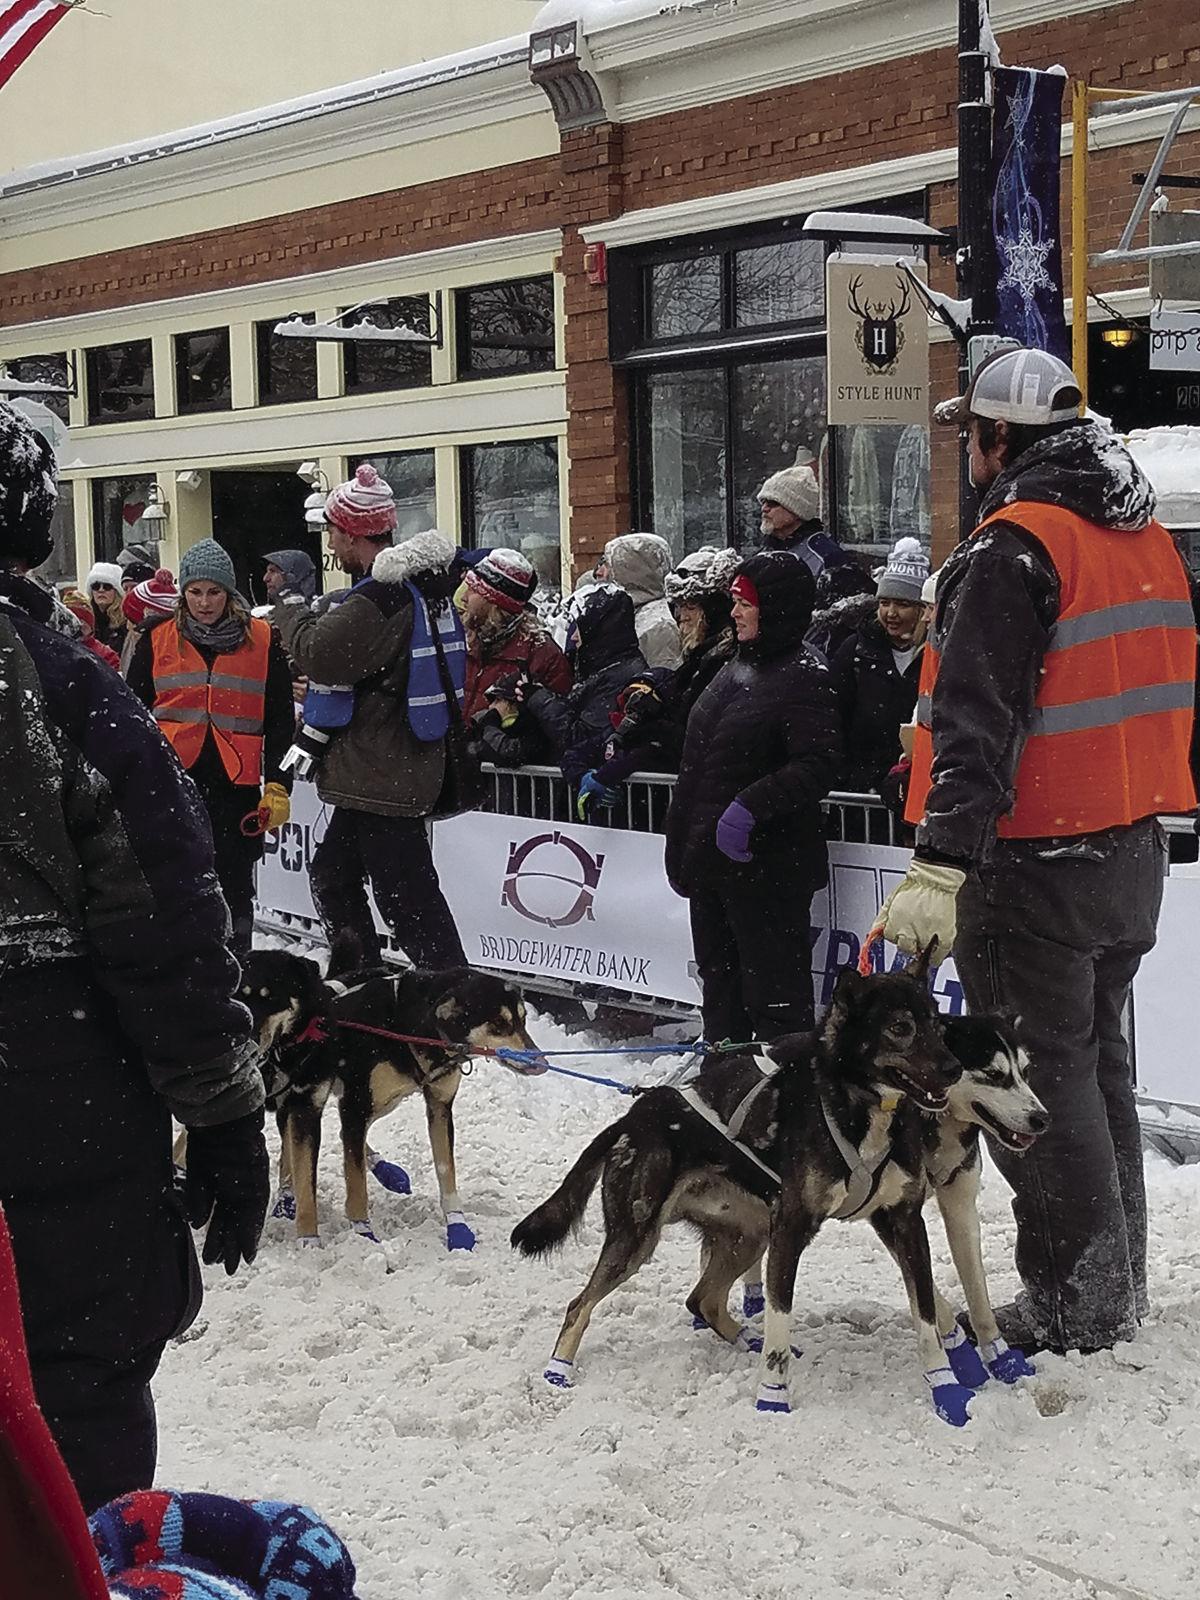 FW13NWLakerPioneerklondike Crowds, dog team 2 min before go time.jpg